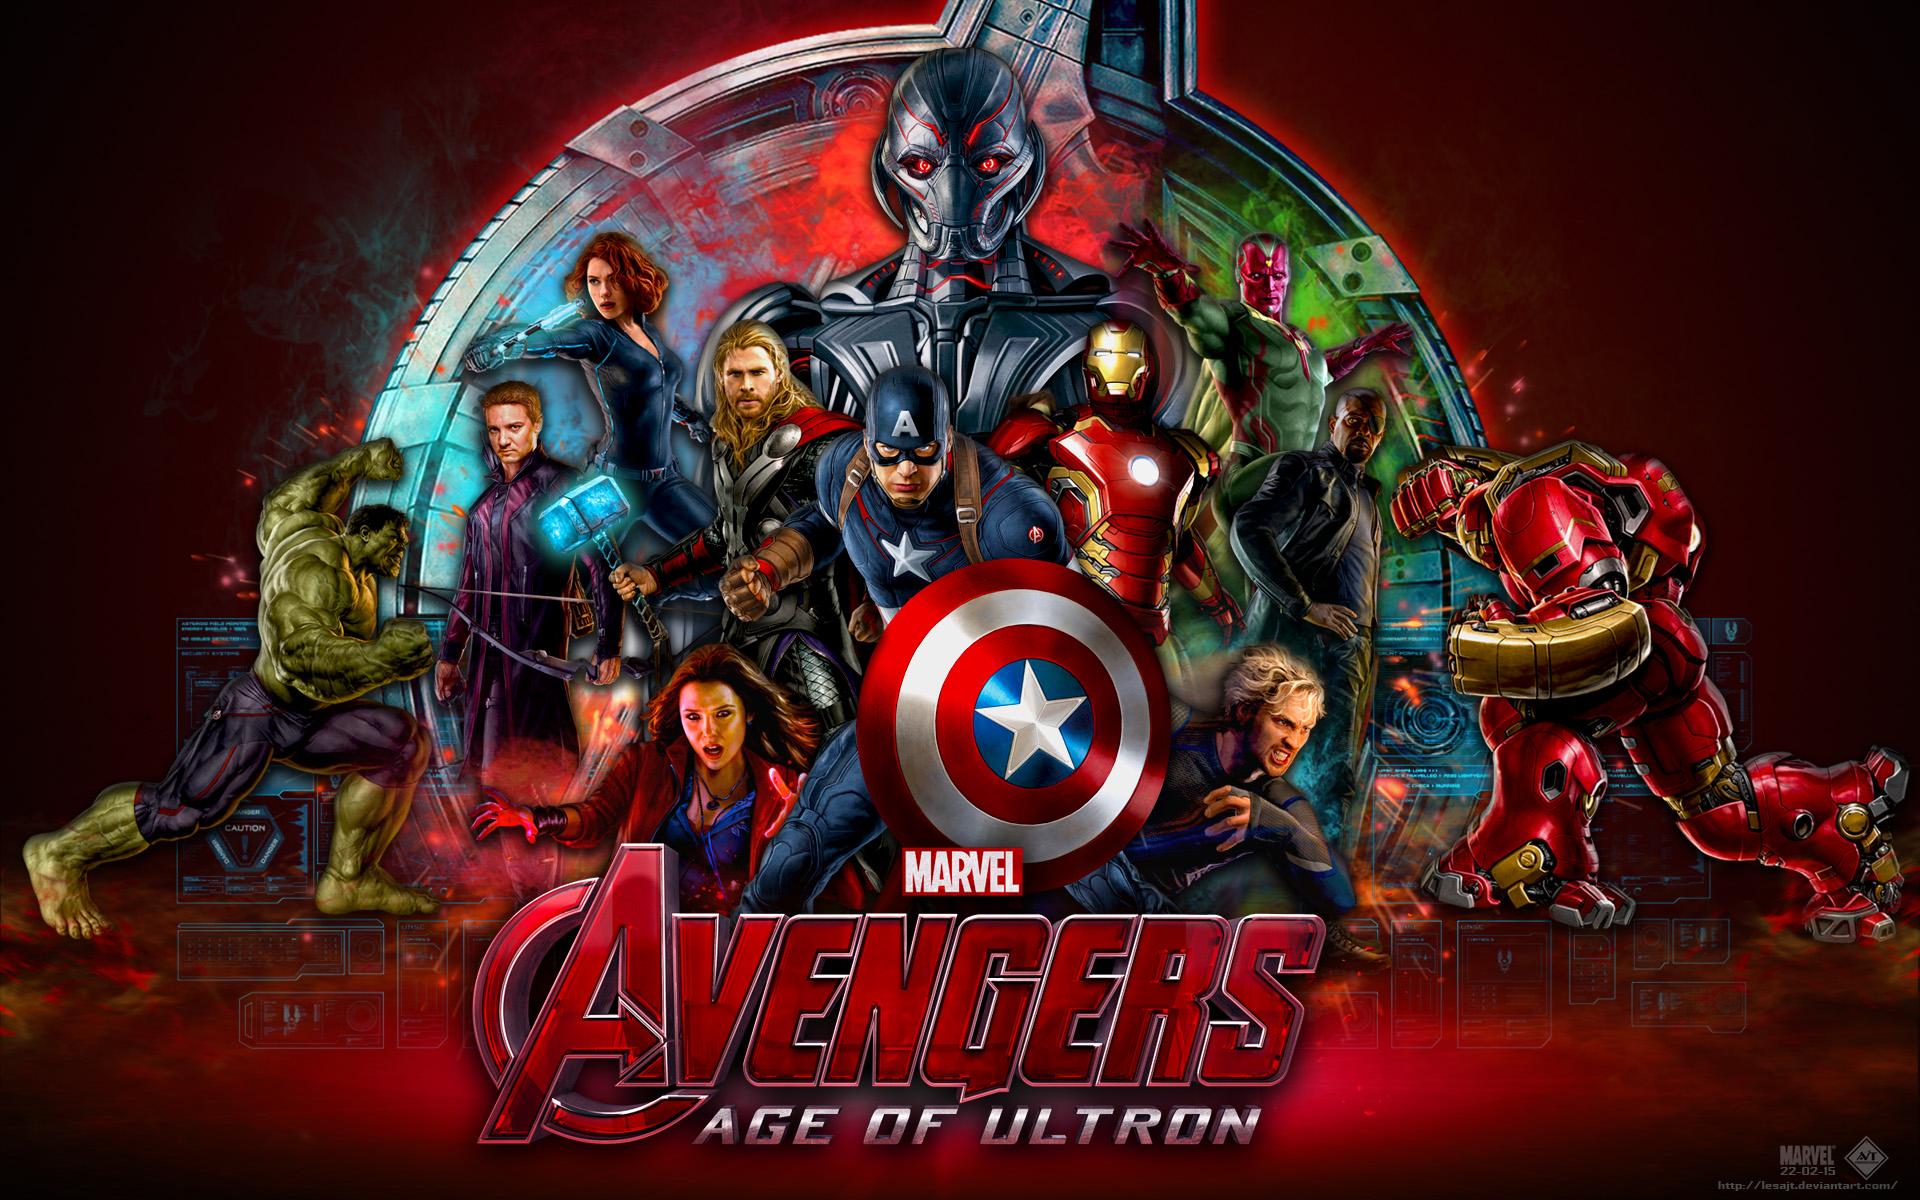 Avengers Age of Ultron Wallpaper - WallpaperSafari